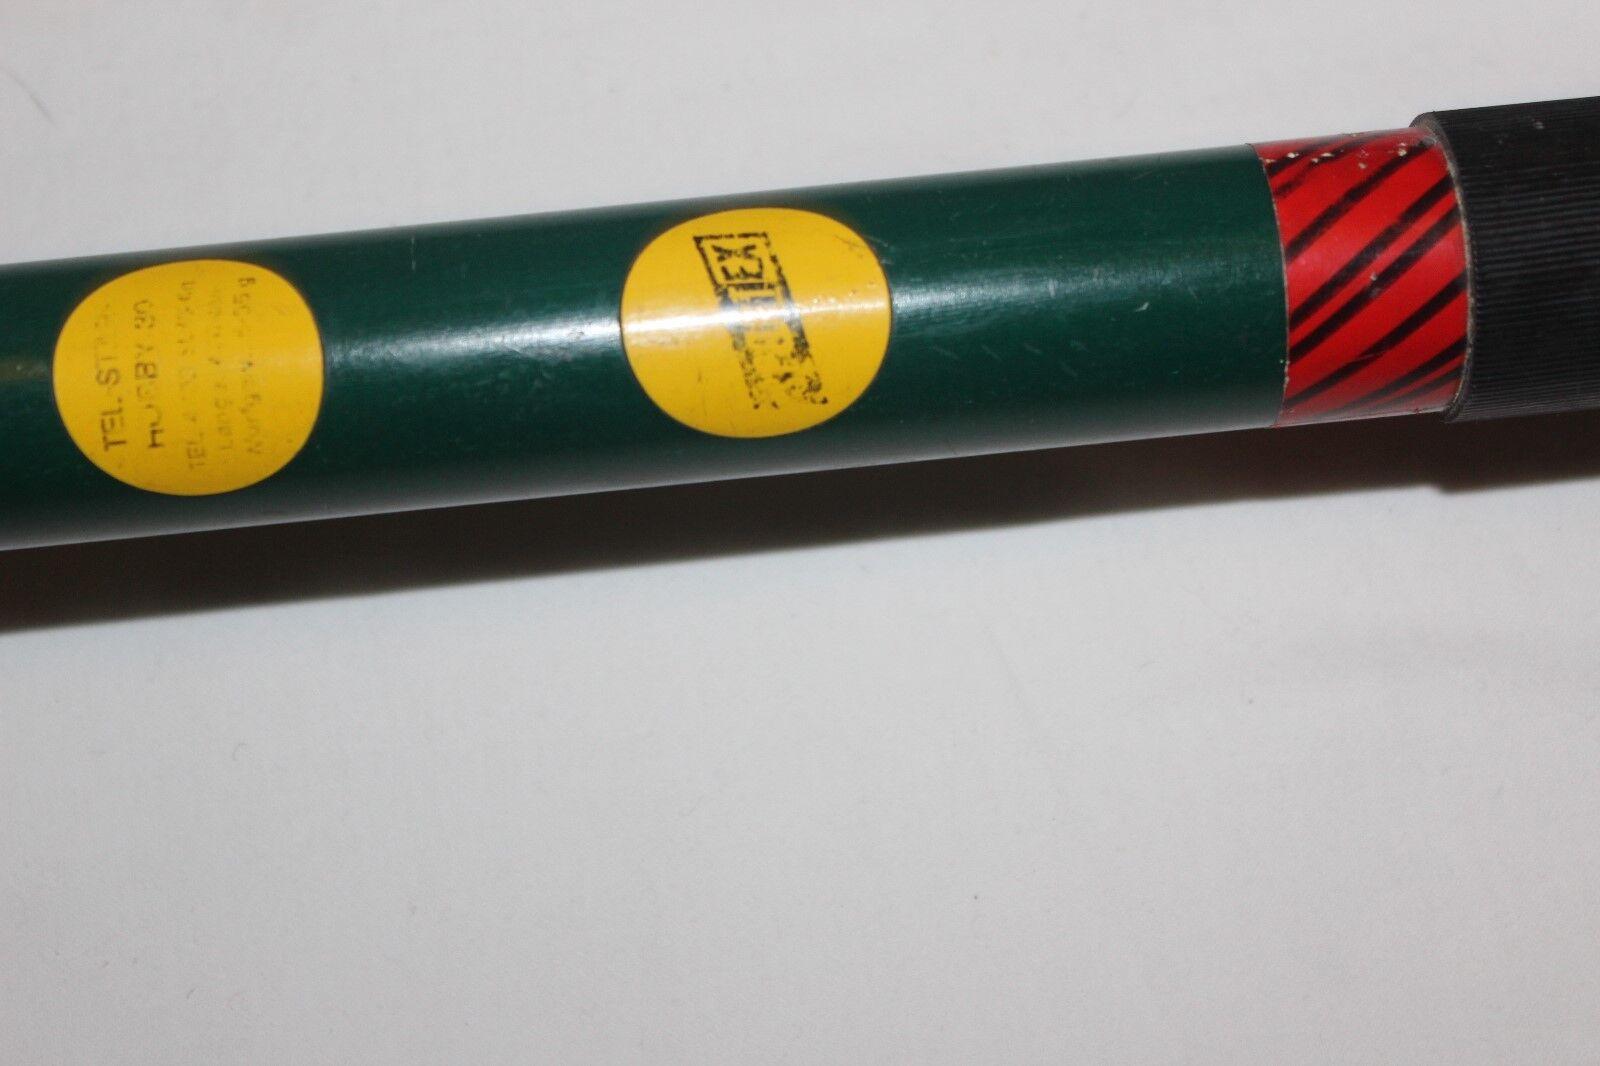 Sportex-Telstar HOBBY - 4,55m-wg 5-35g-nr-347